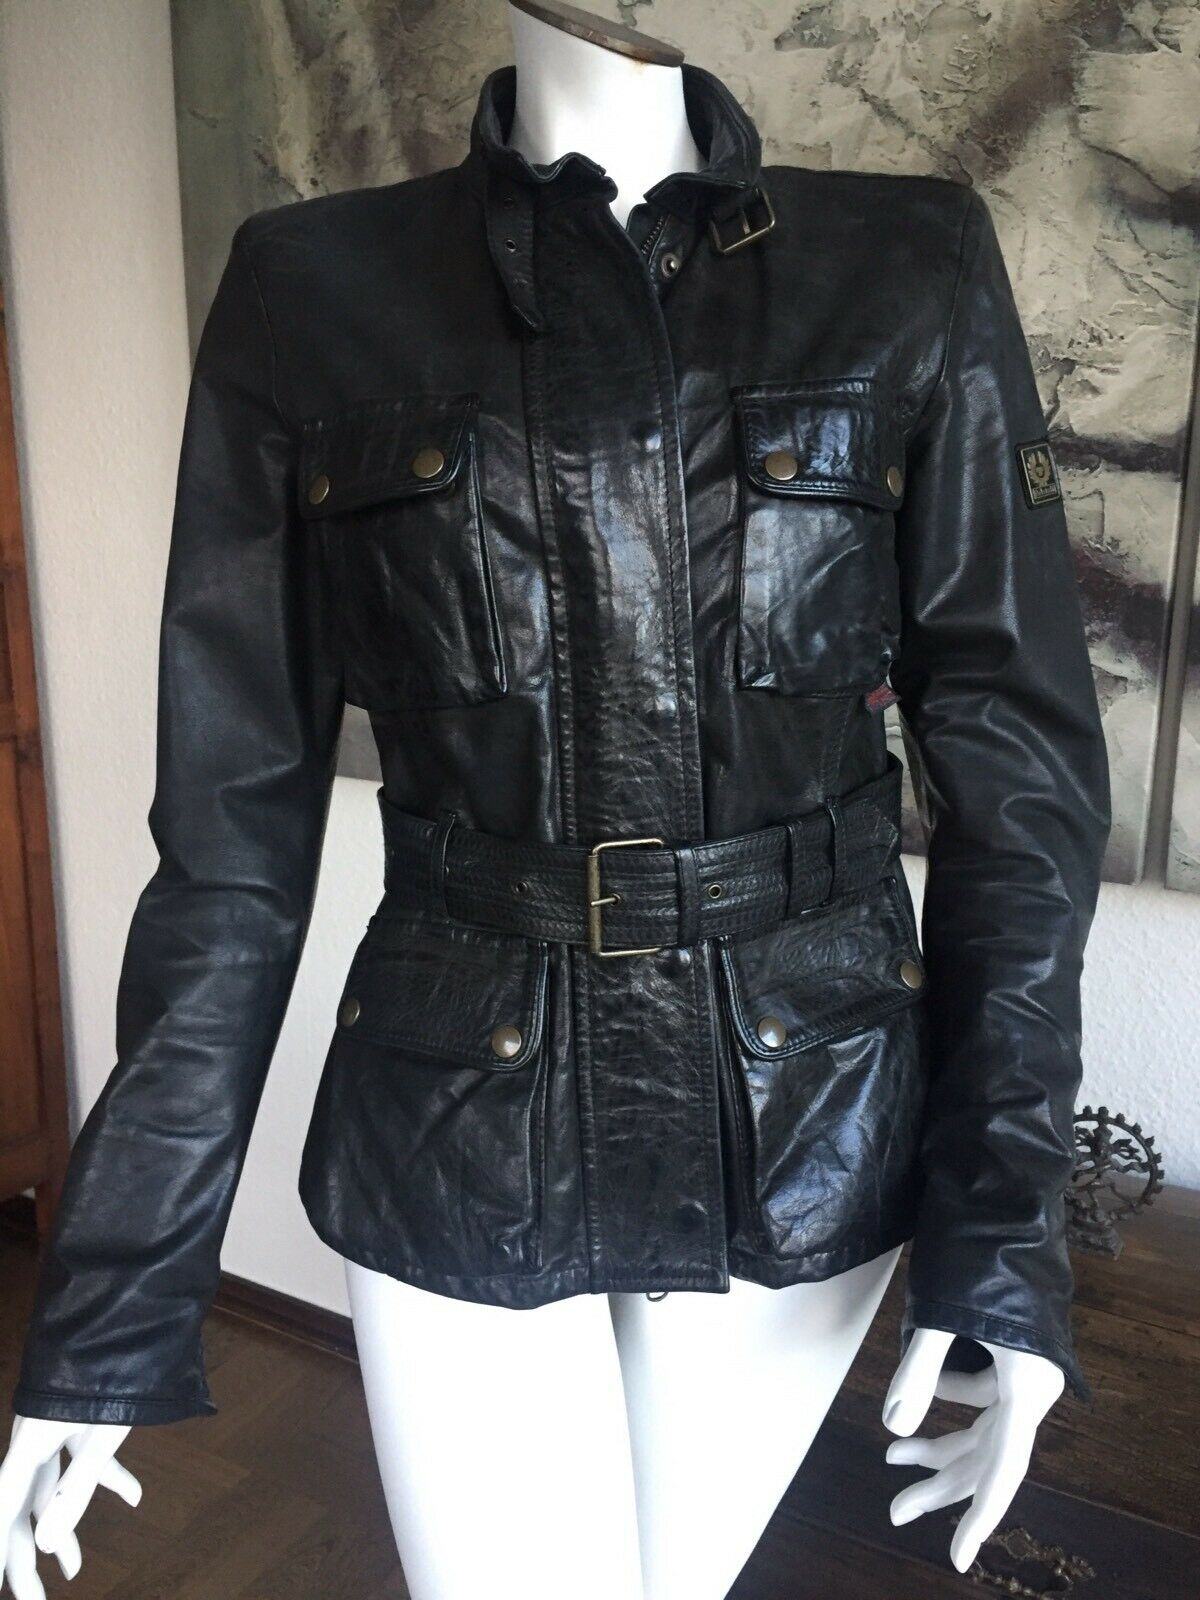 767bd7a1d33c83 BELSTAFF Lederjacke Damen Gr. 38 IT. 46 Schwarz Jacke Panther Leather Jacket